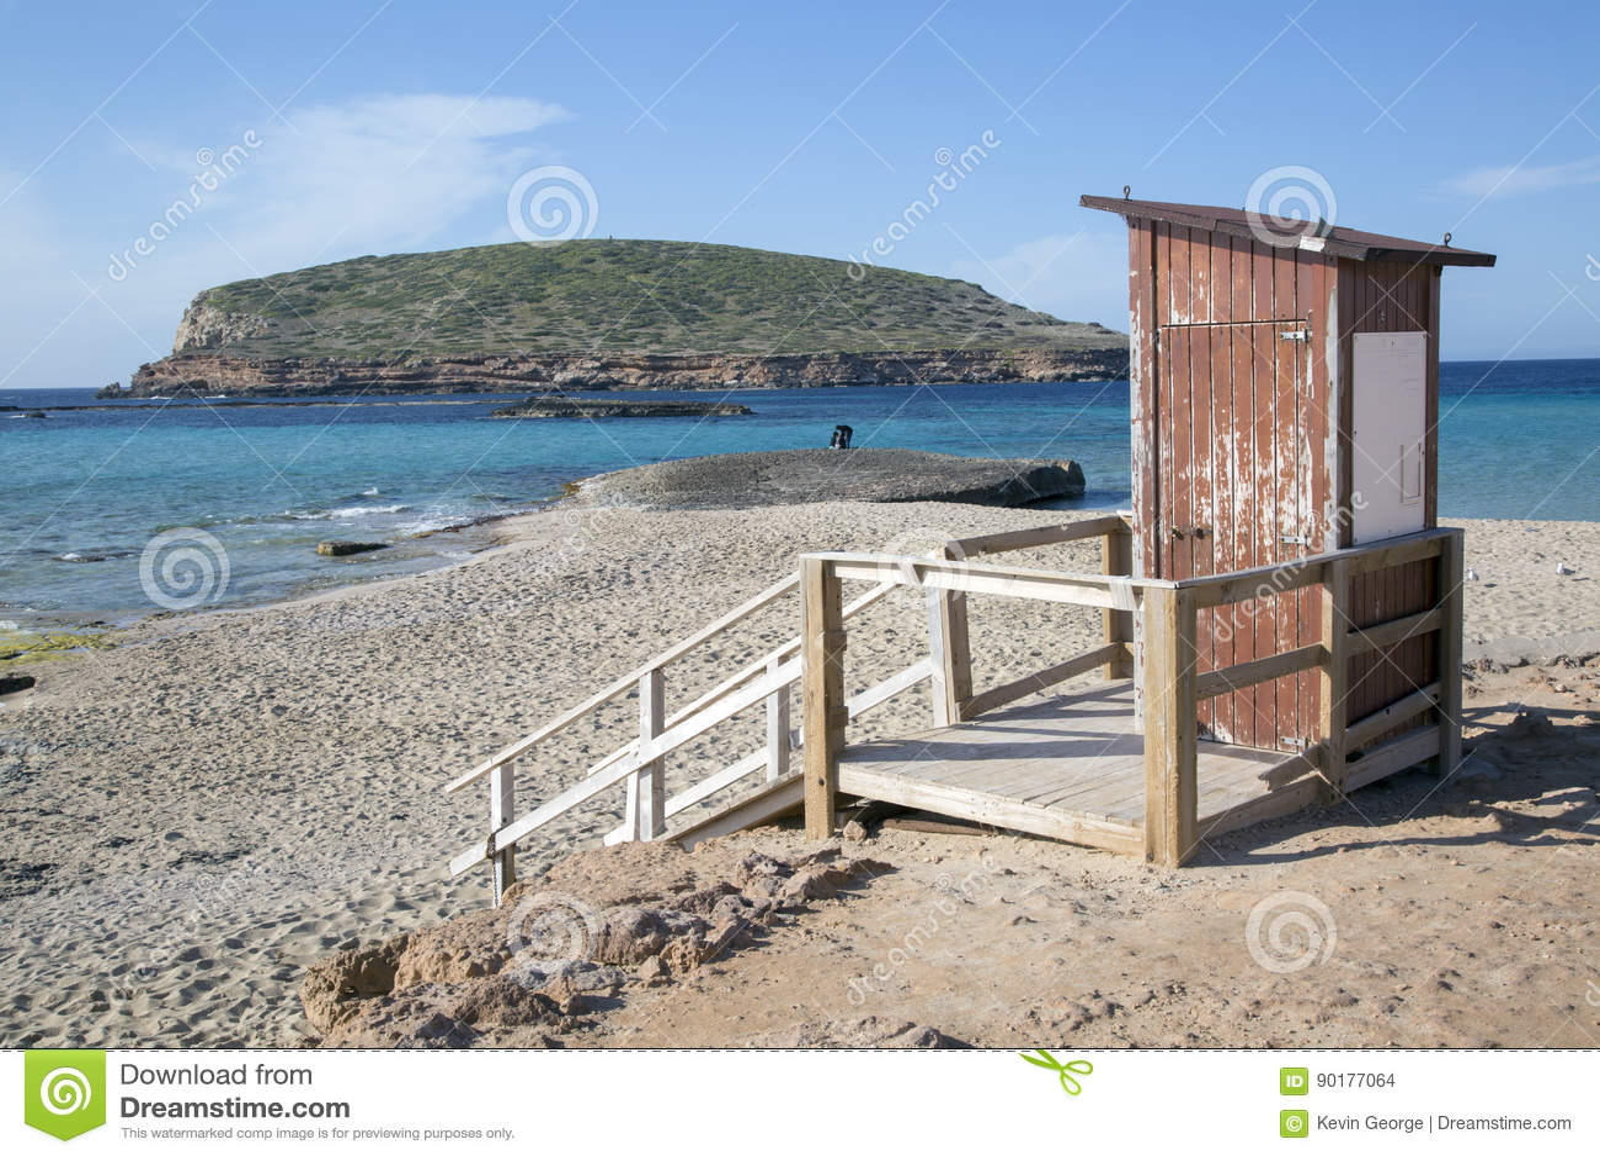 Comte Beaches, Ibiza, Spain Stock Photo - Image of rock